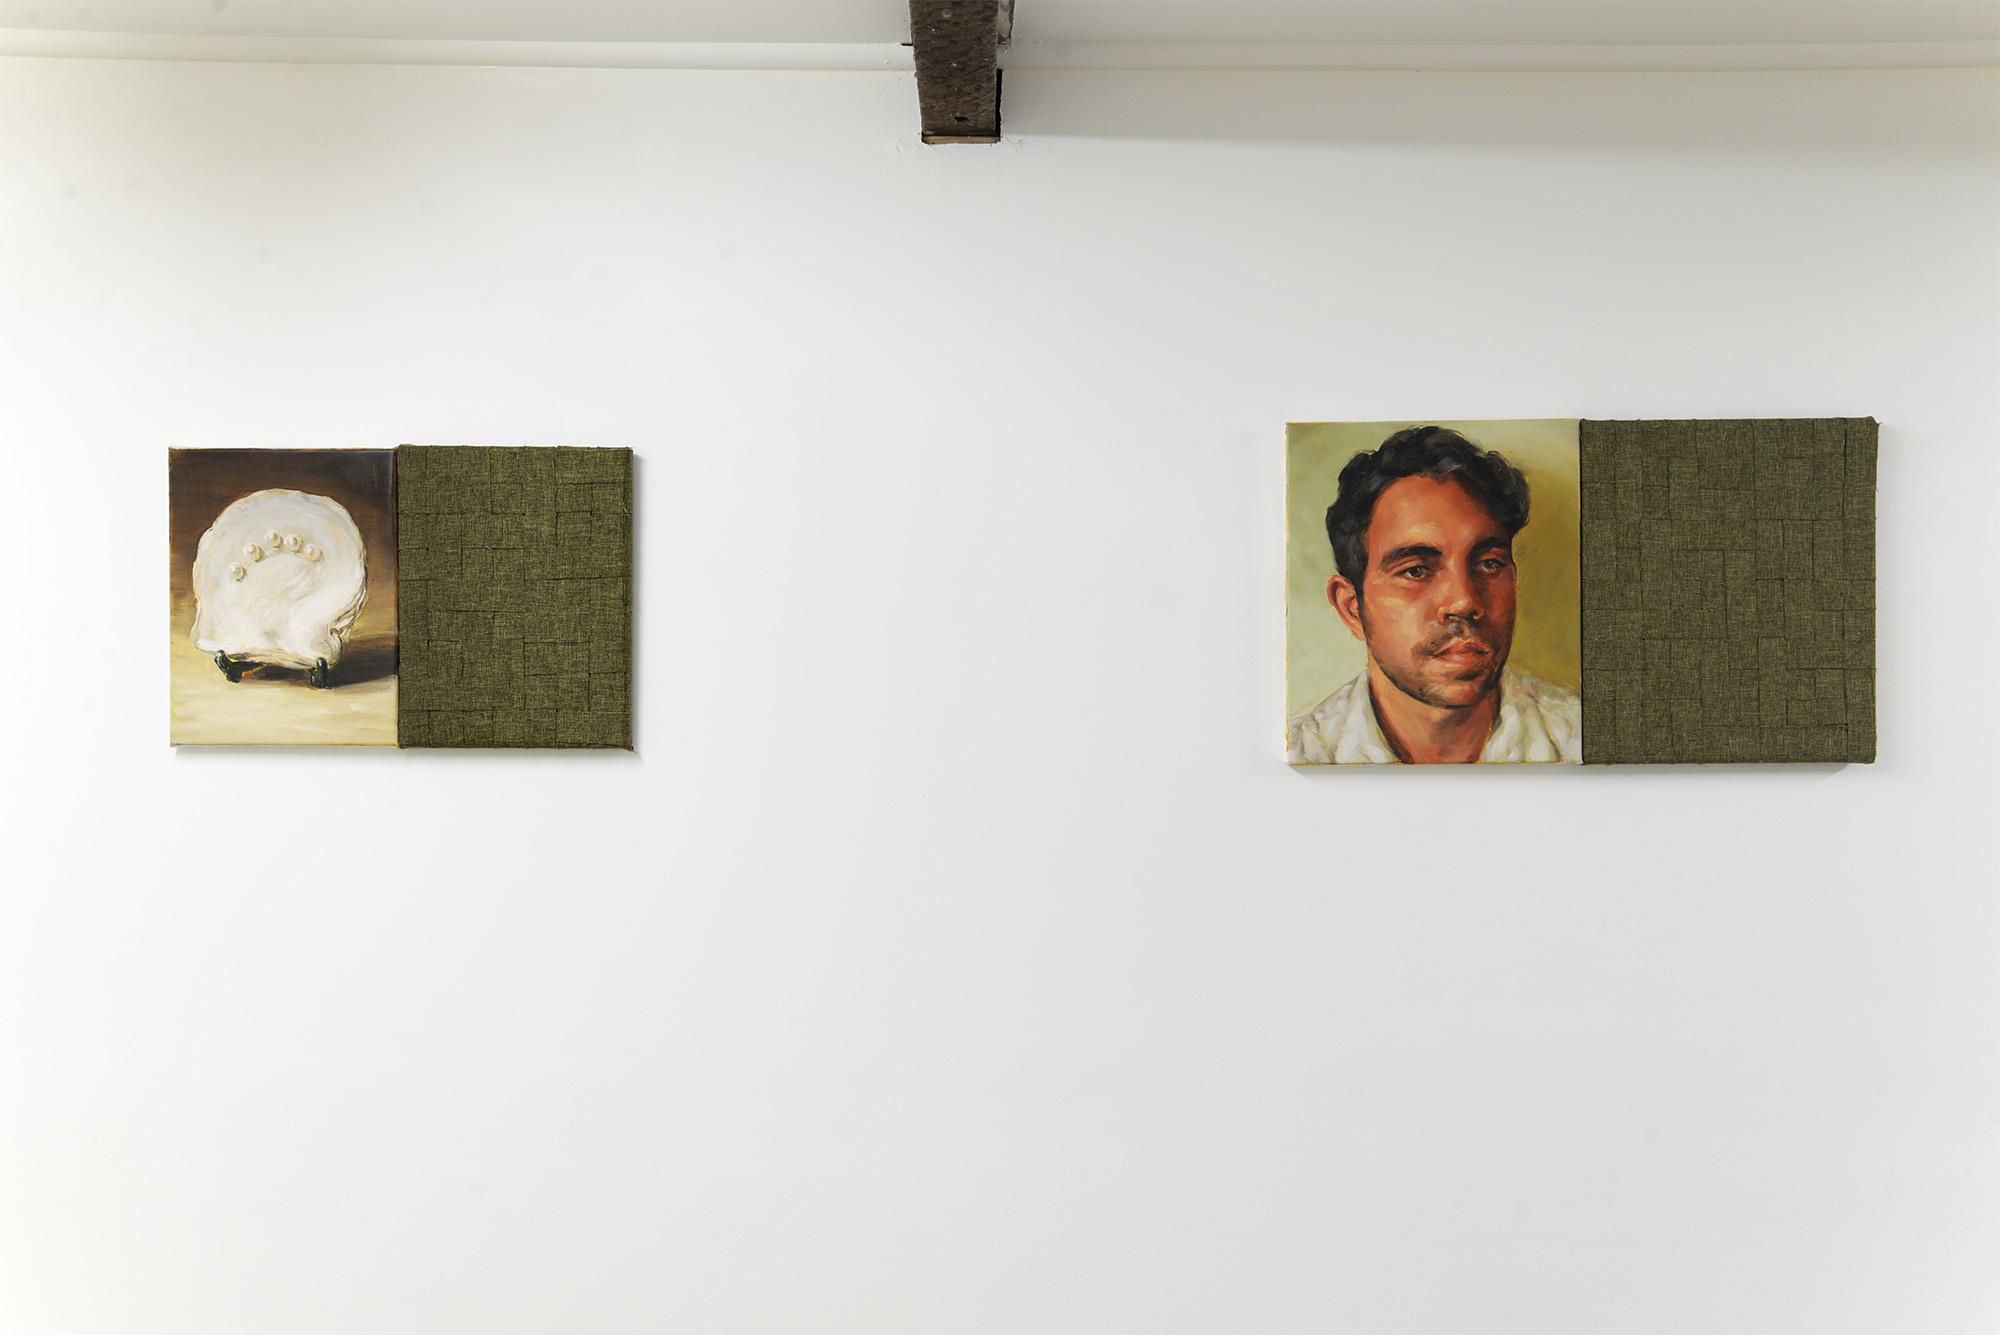 Left: Combine (Mother-of-Pearl) 2018 oil on canvas, linen weave 31cm x 47cm Right: Combine (Portrait) 2018 oil on canvas, linen weave 36cm x 62cm